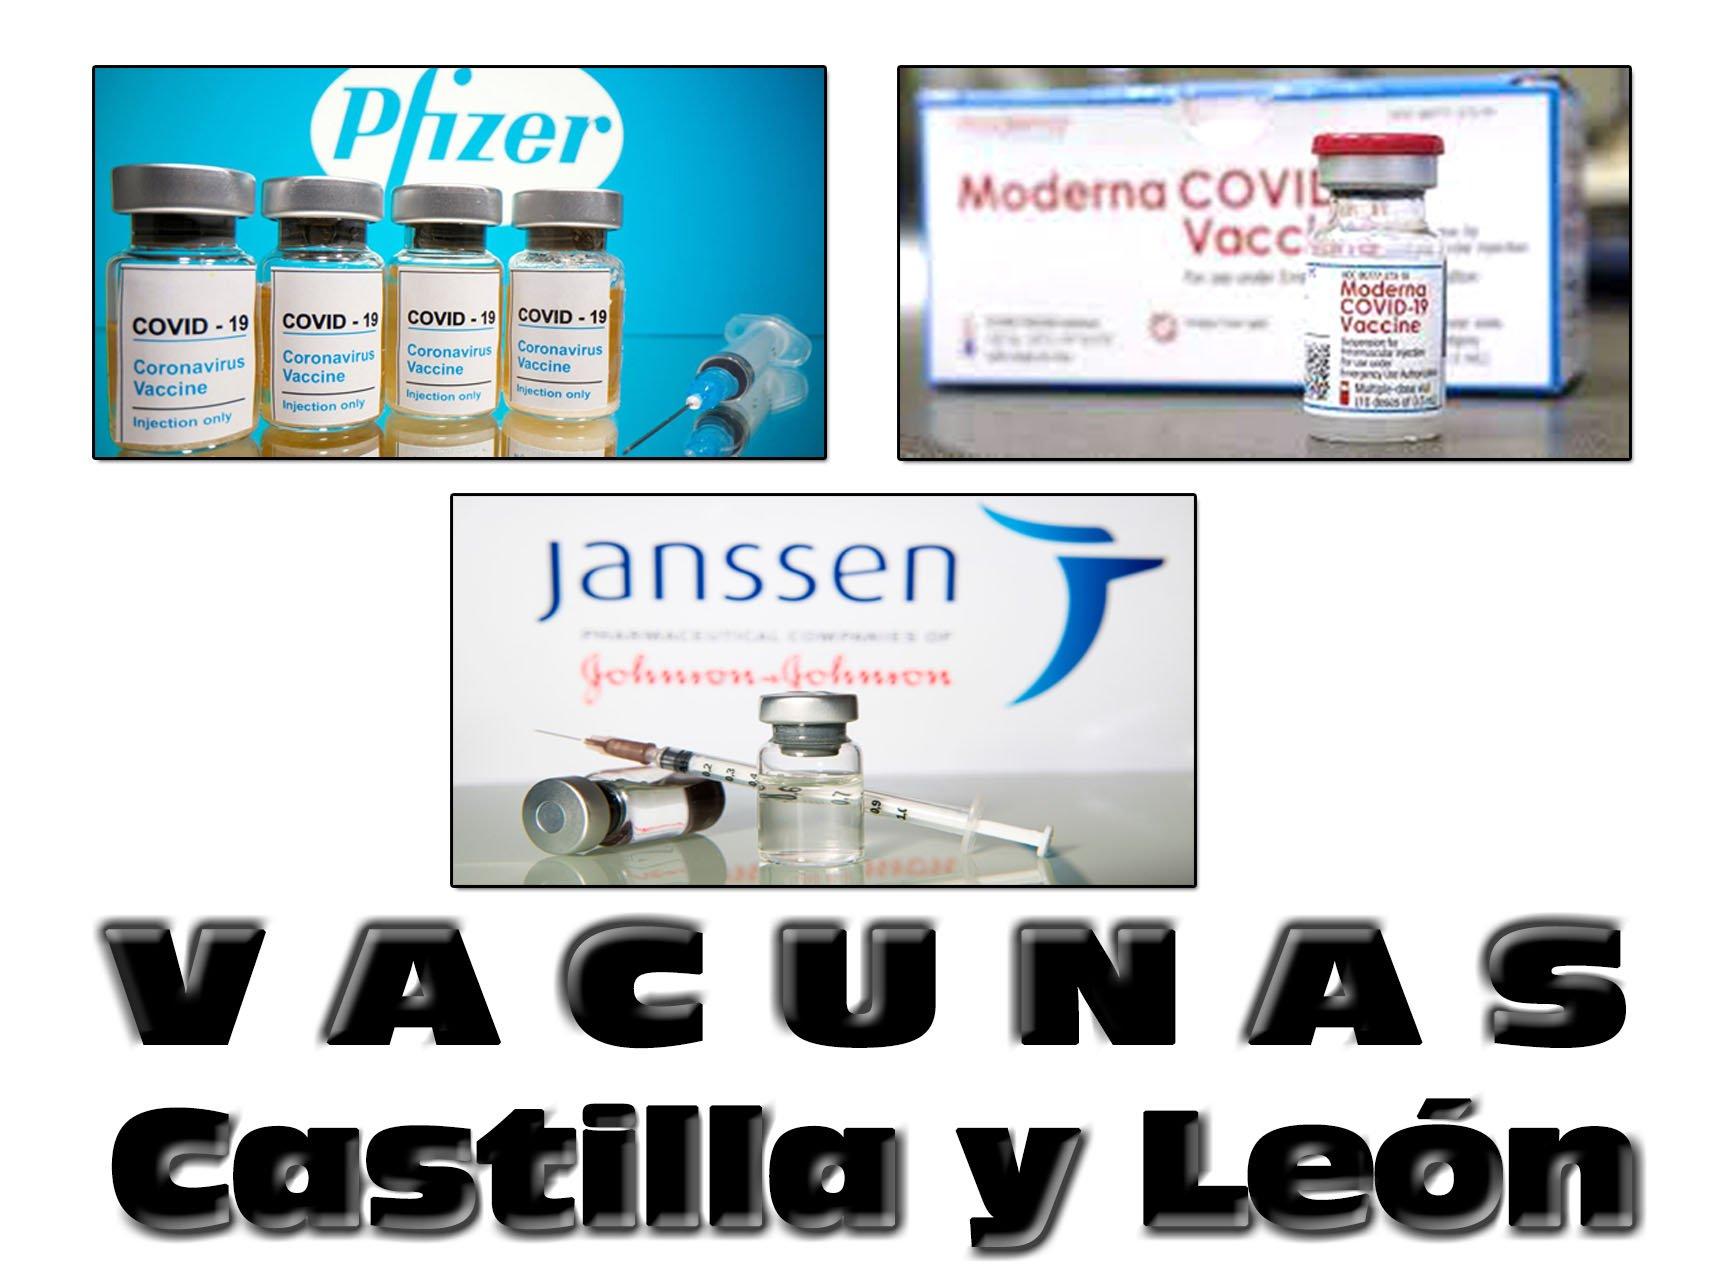 Vacuna de Pfizer-BioNTech, Moderna y Janssen frente a la COVID-19